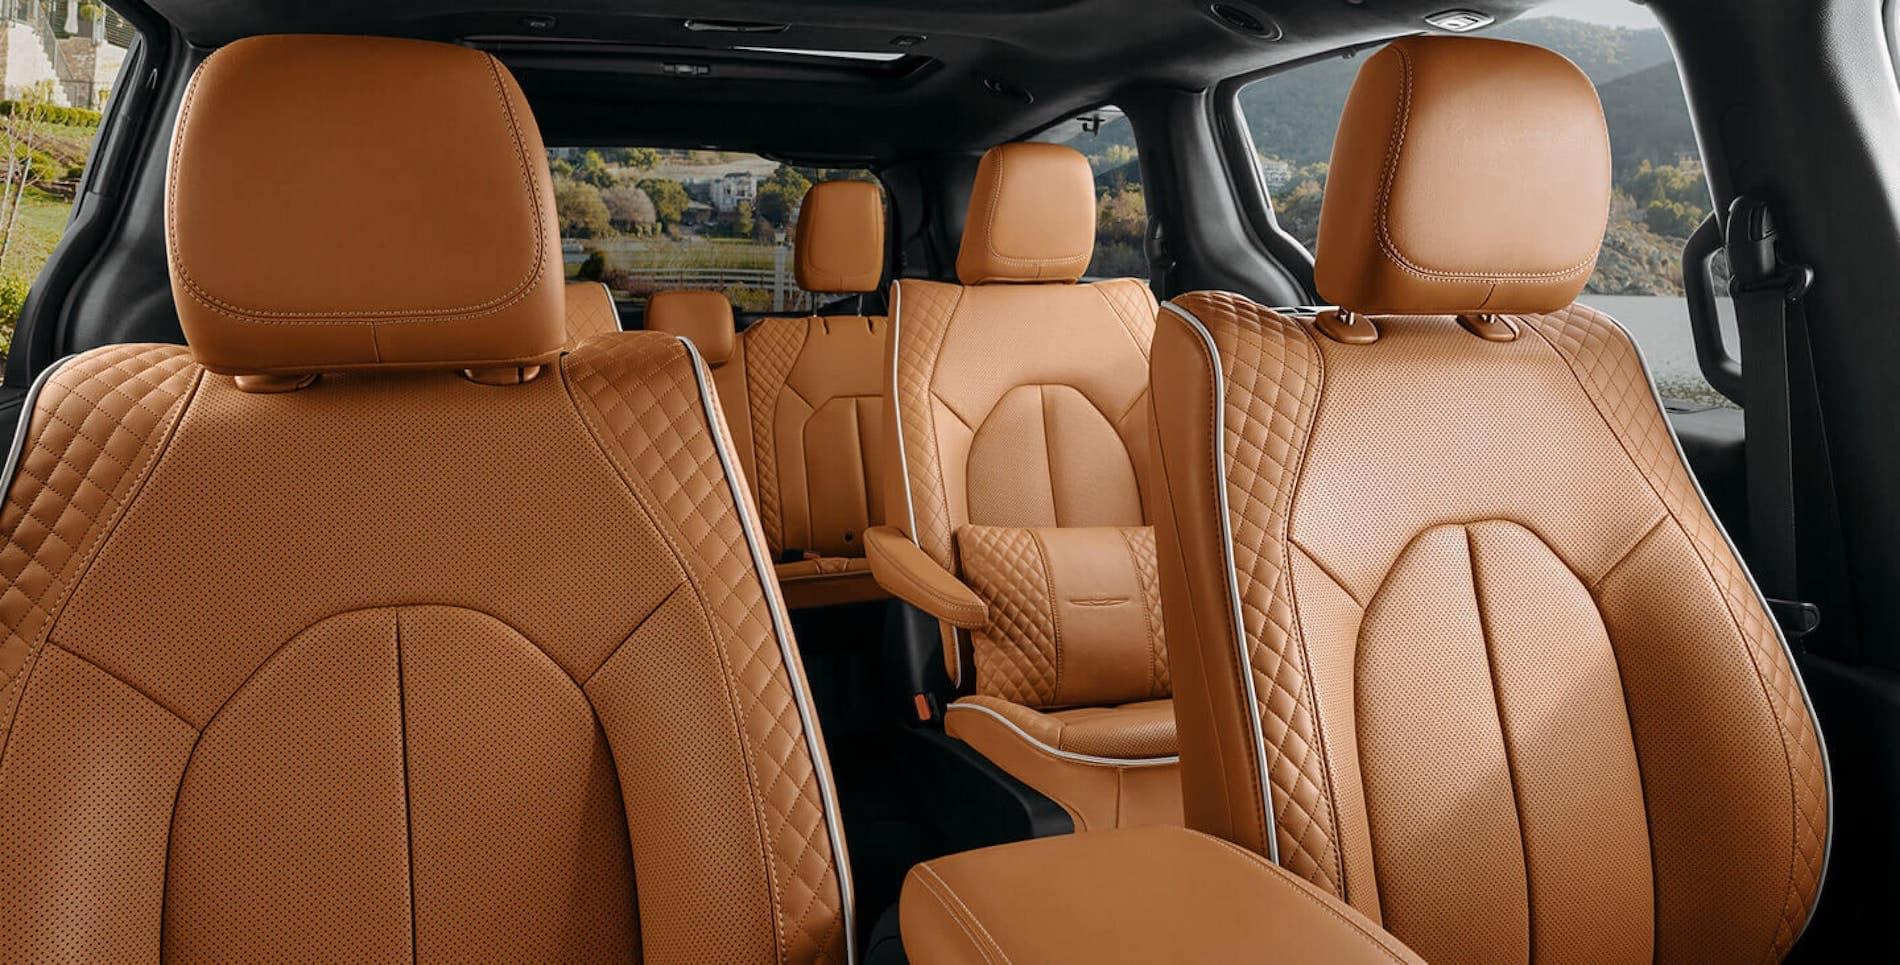 2021 Pacifica Brown leather interior in Warrenton, VA